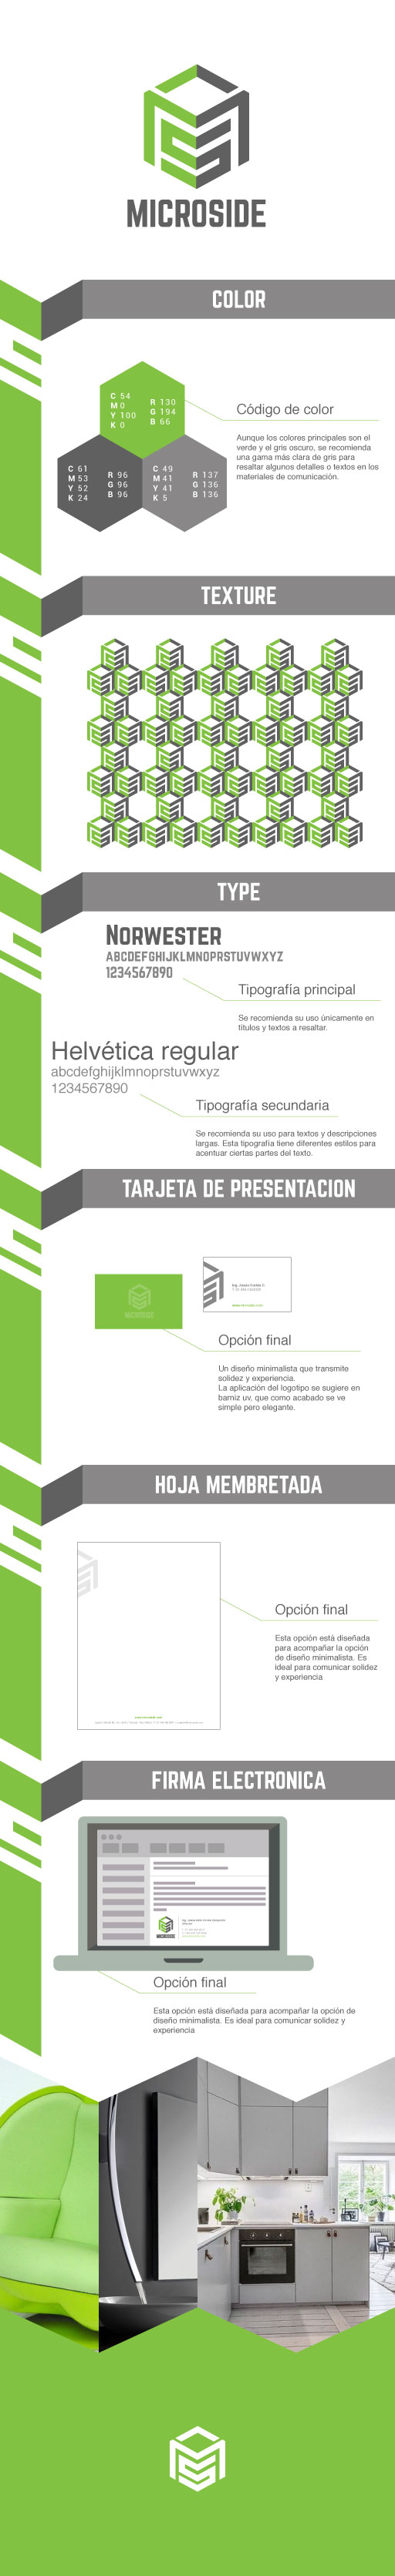 Microside brand guide by byDaliaPamela